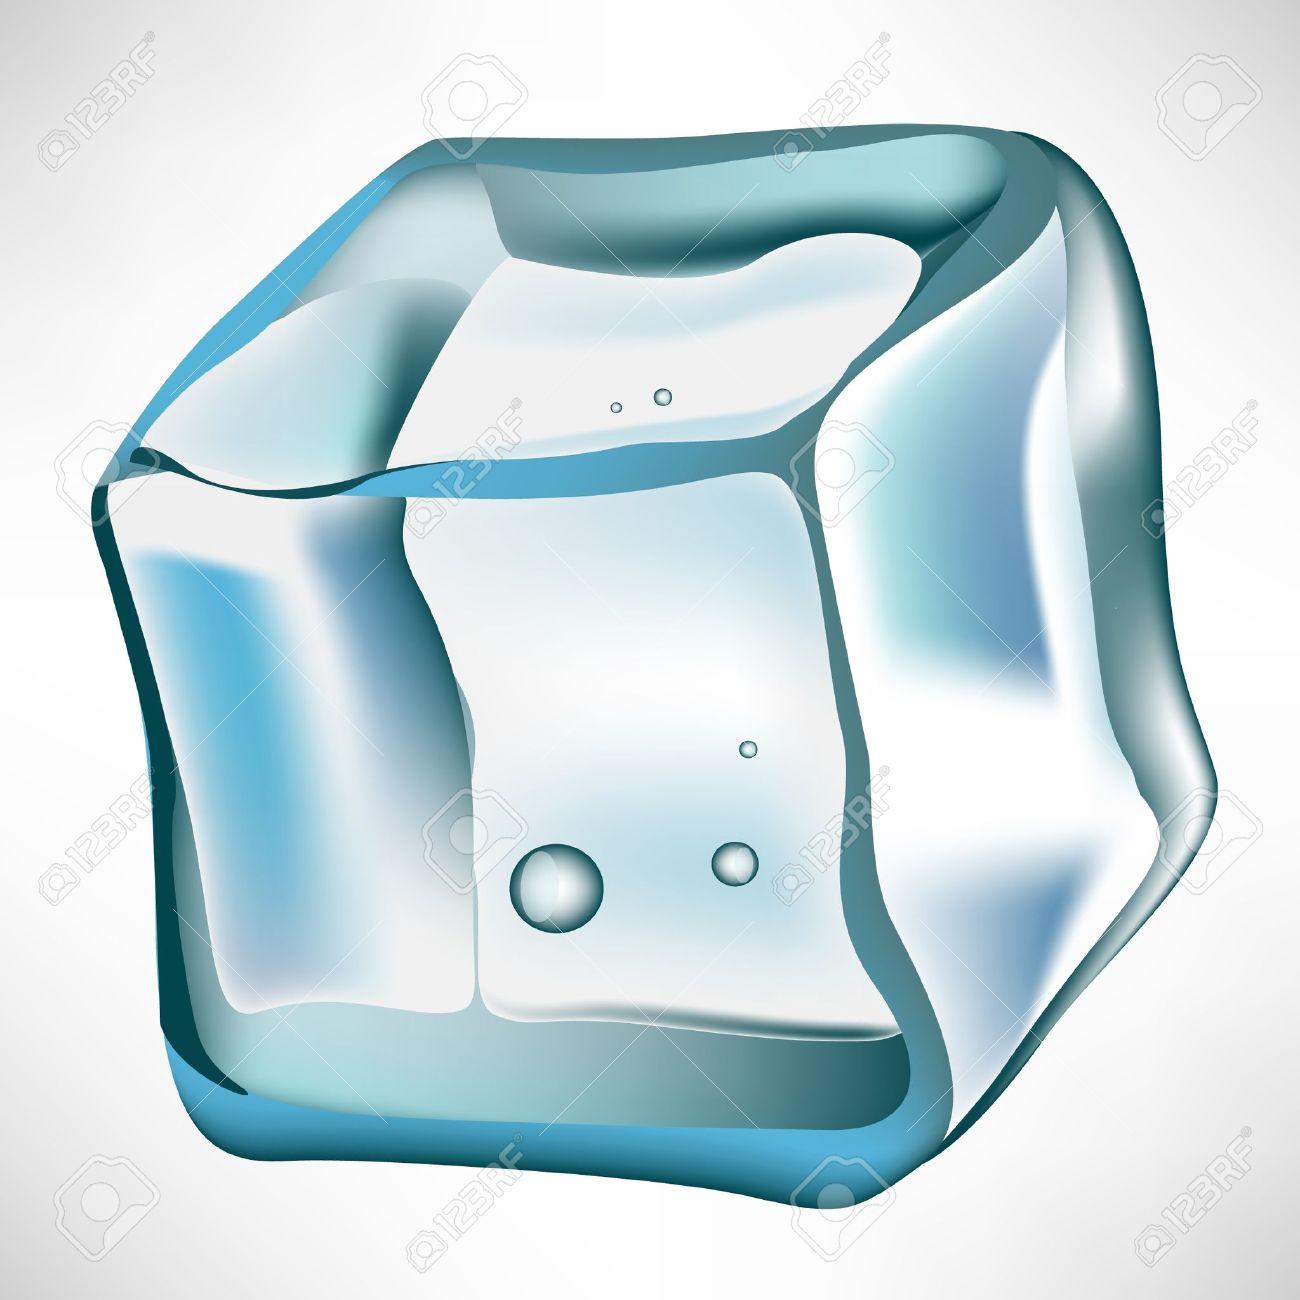 Ice clipart #15